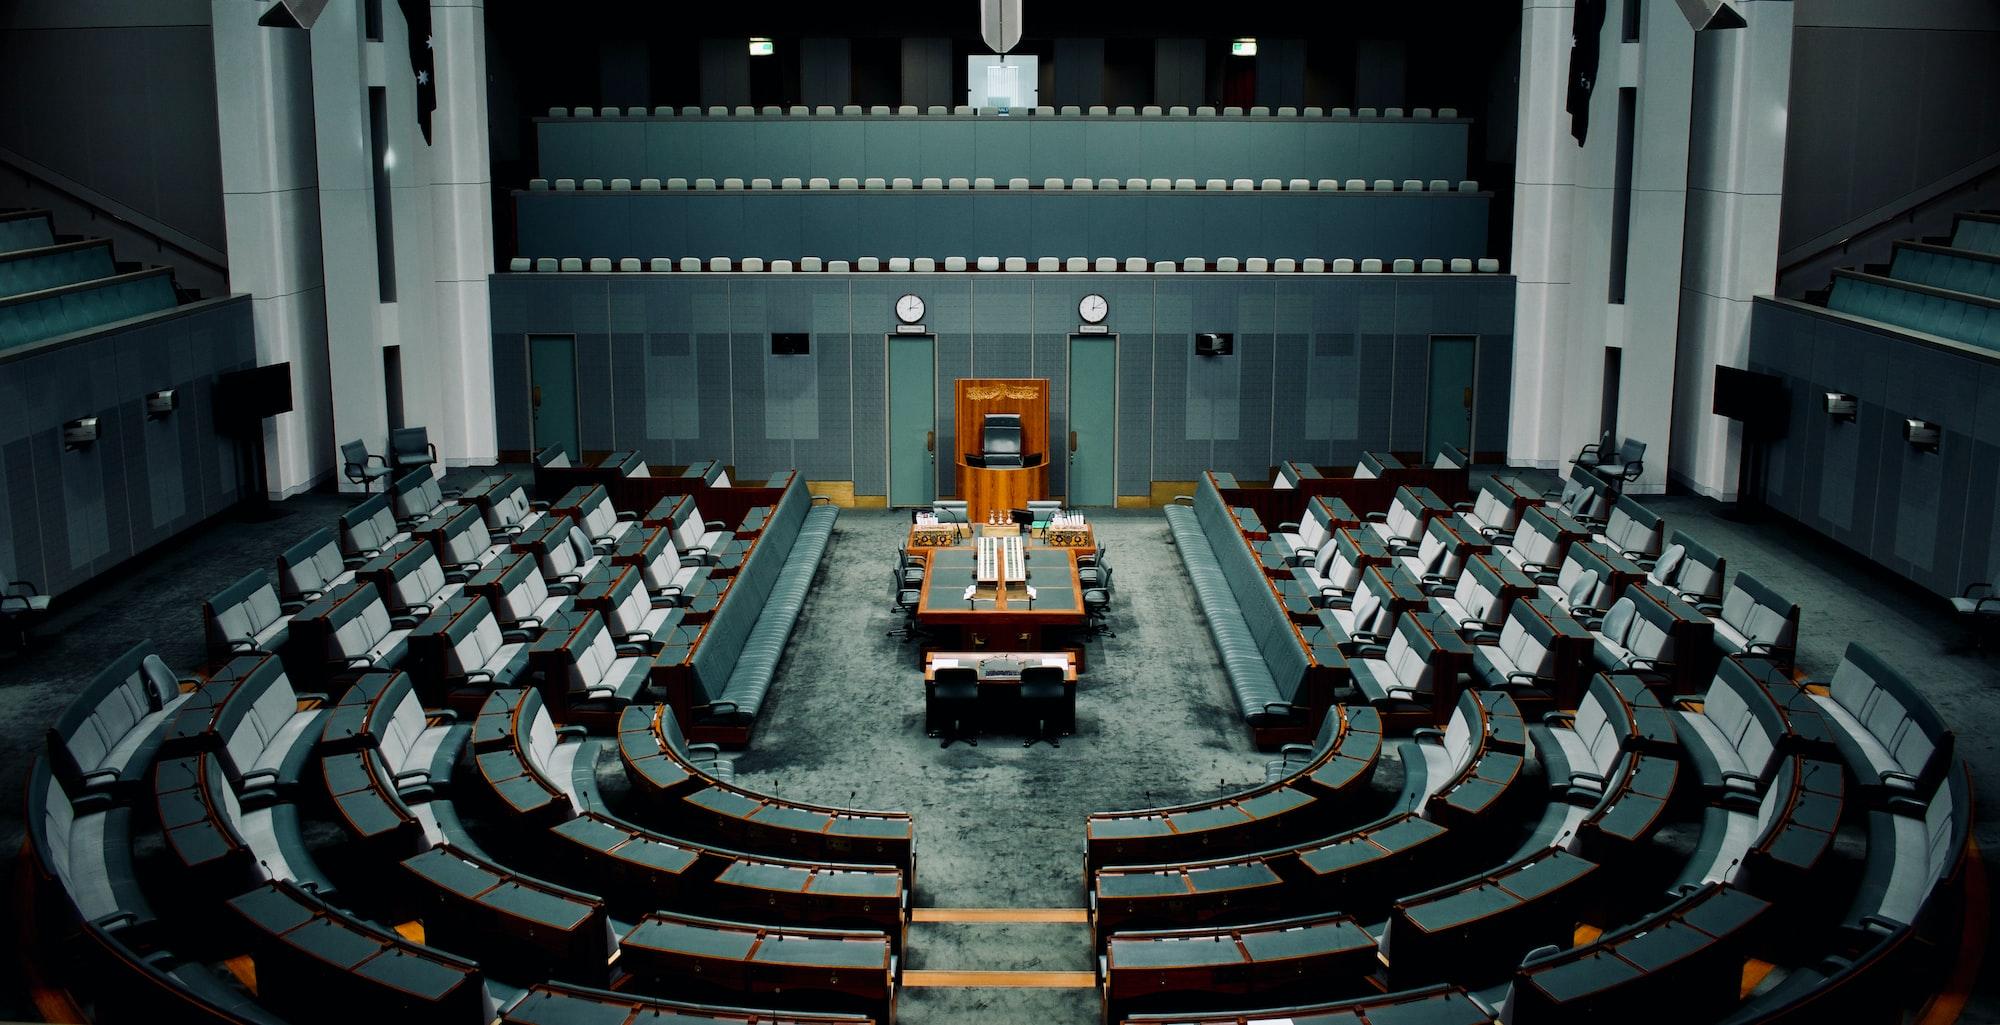 The Australian House of Representatives at the Australian Parliament